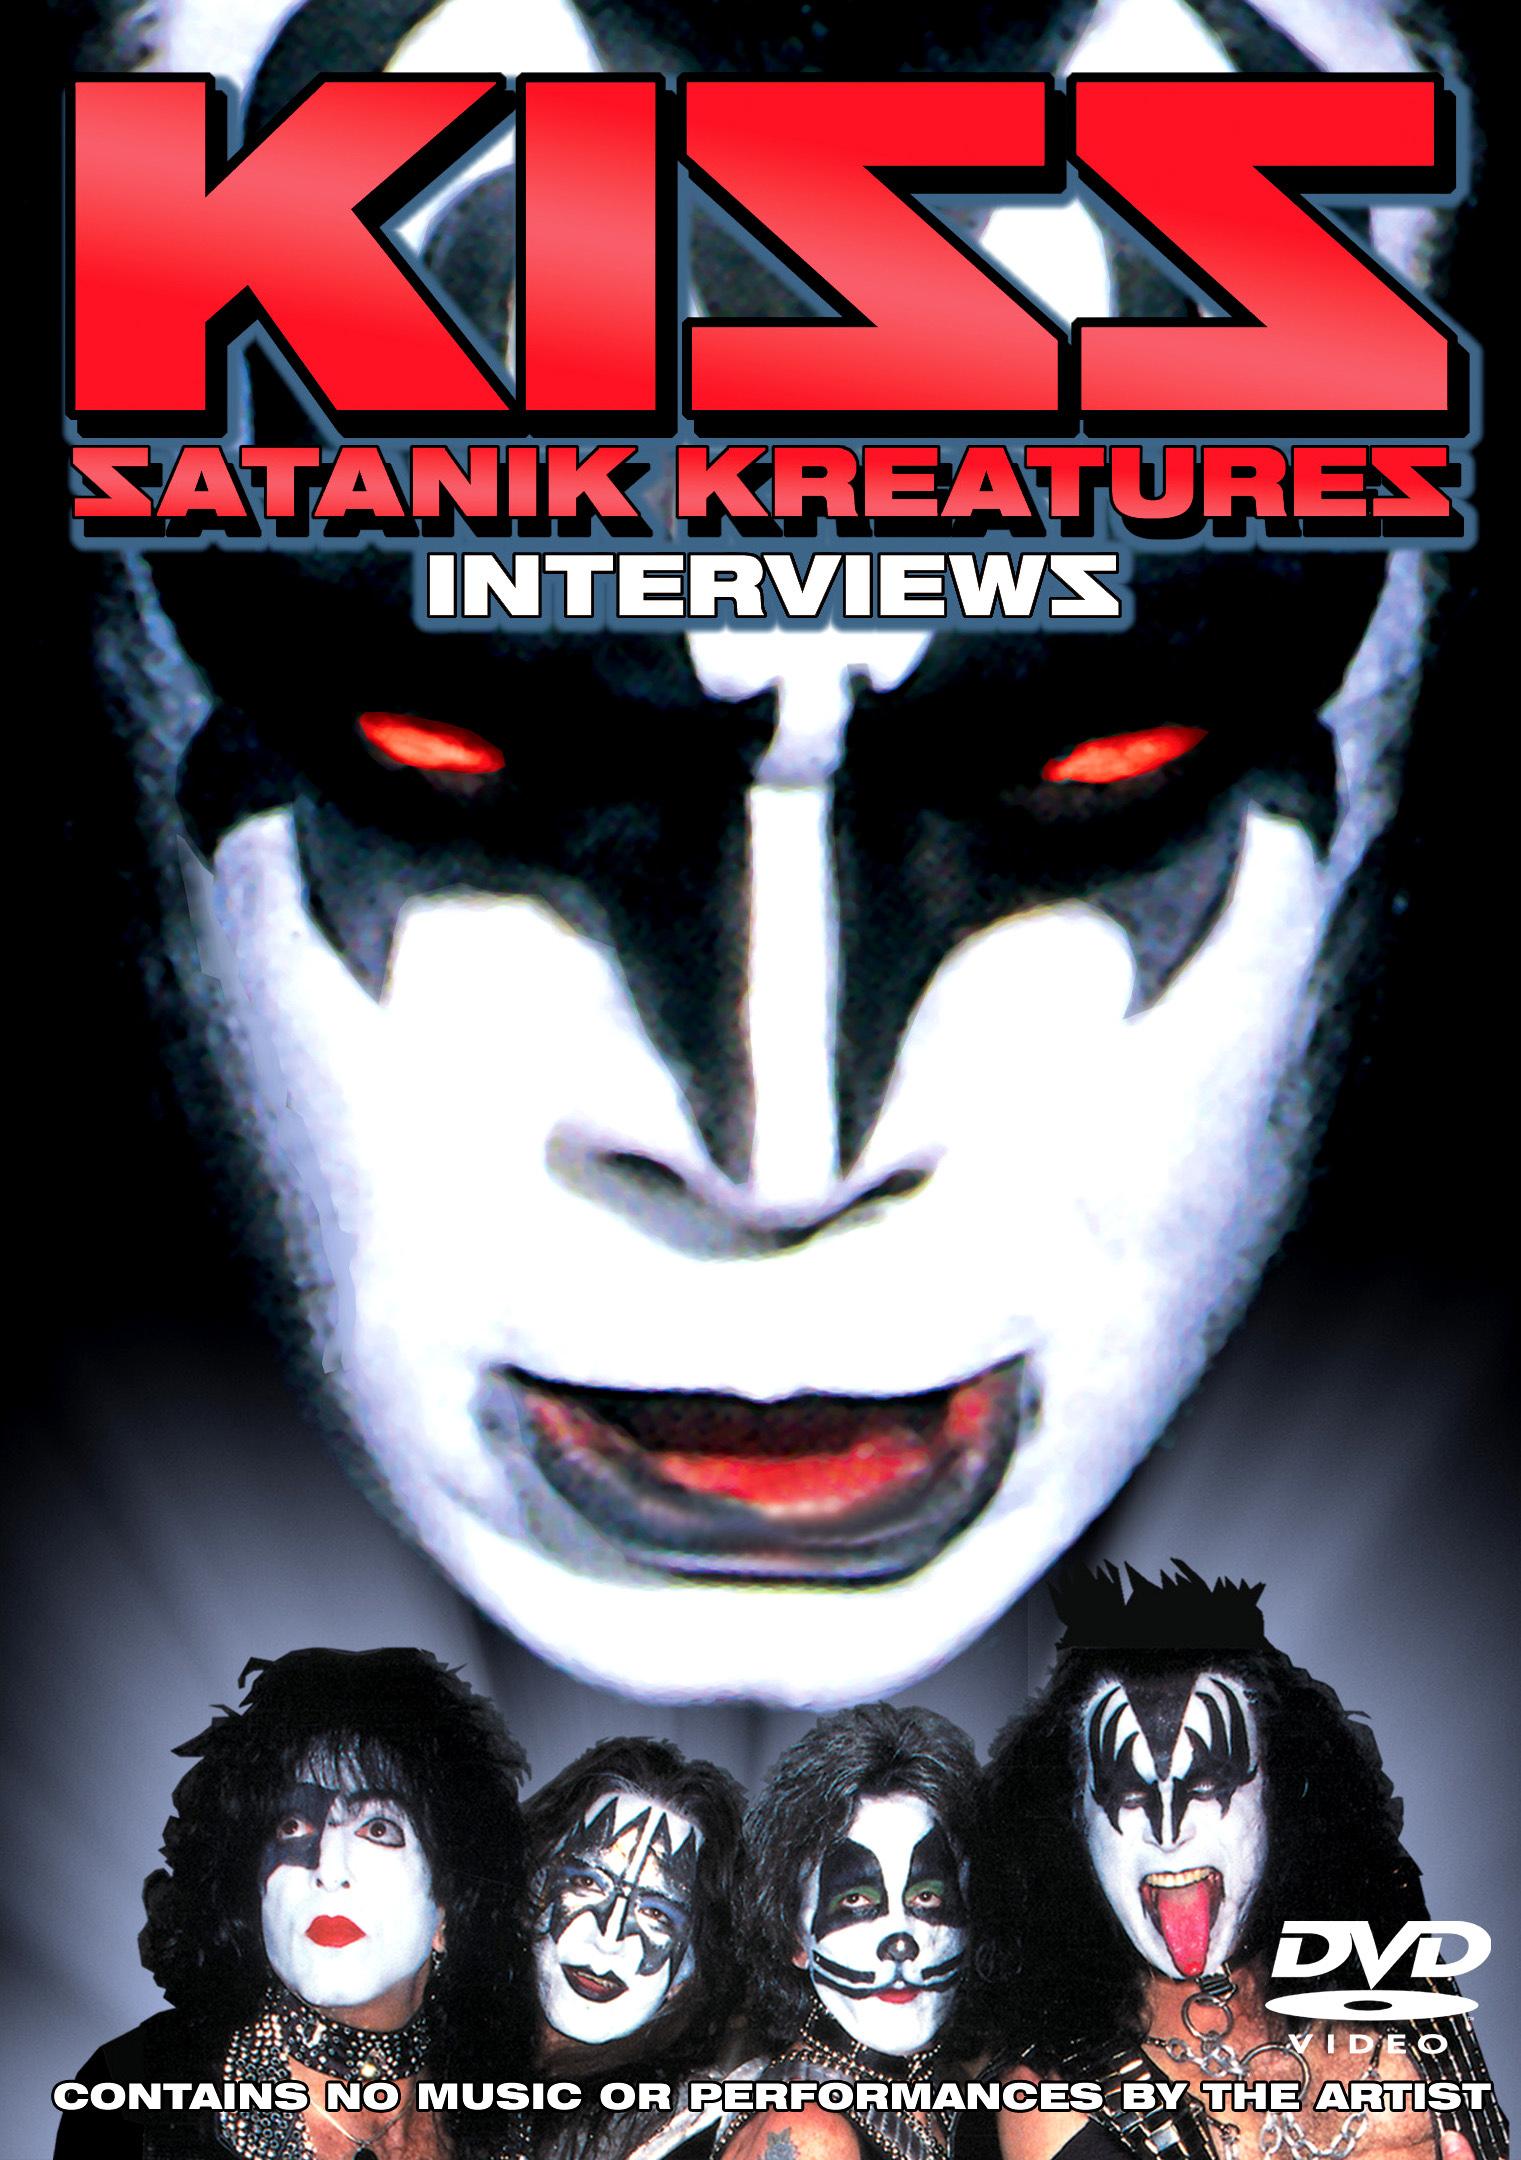 KISS: Satanik Kreatures - Interviews